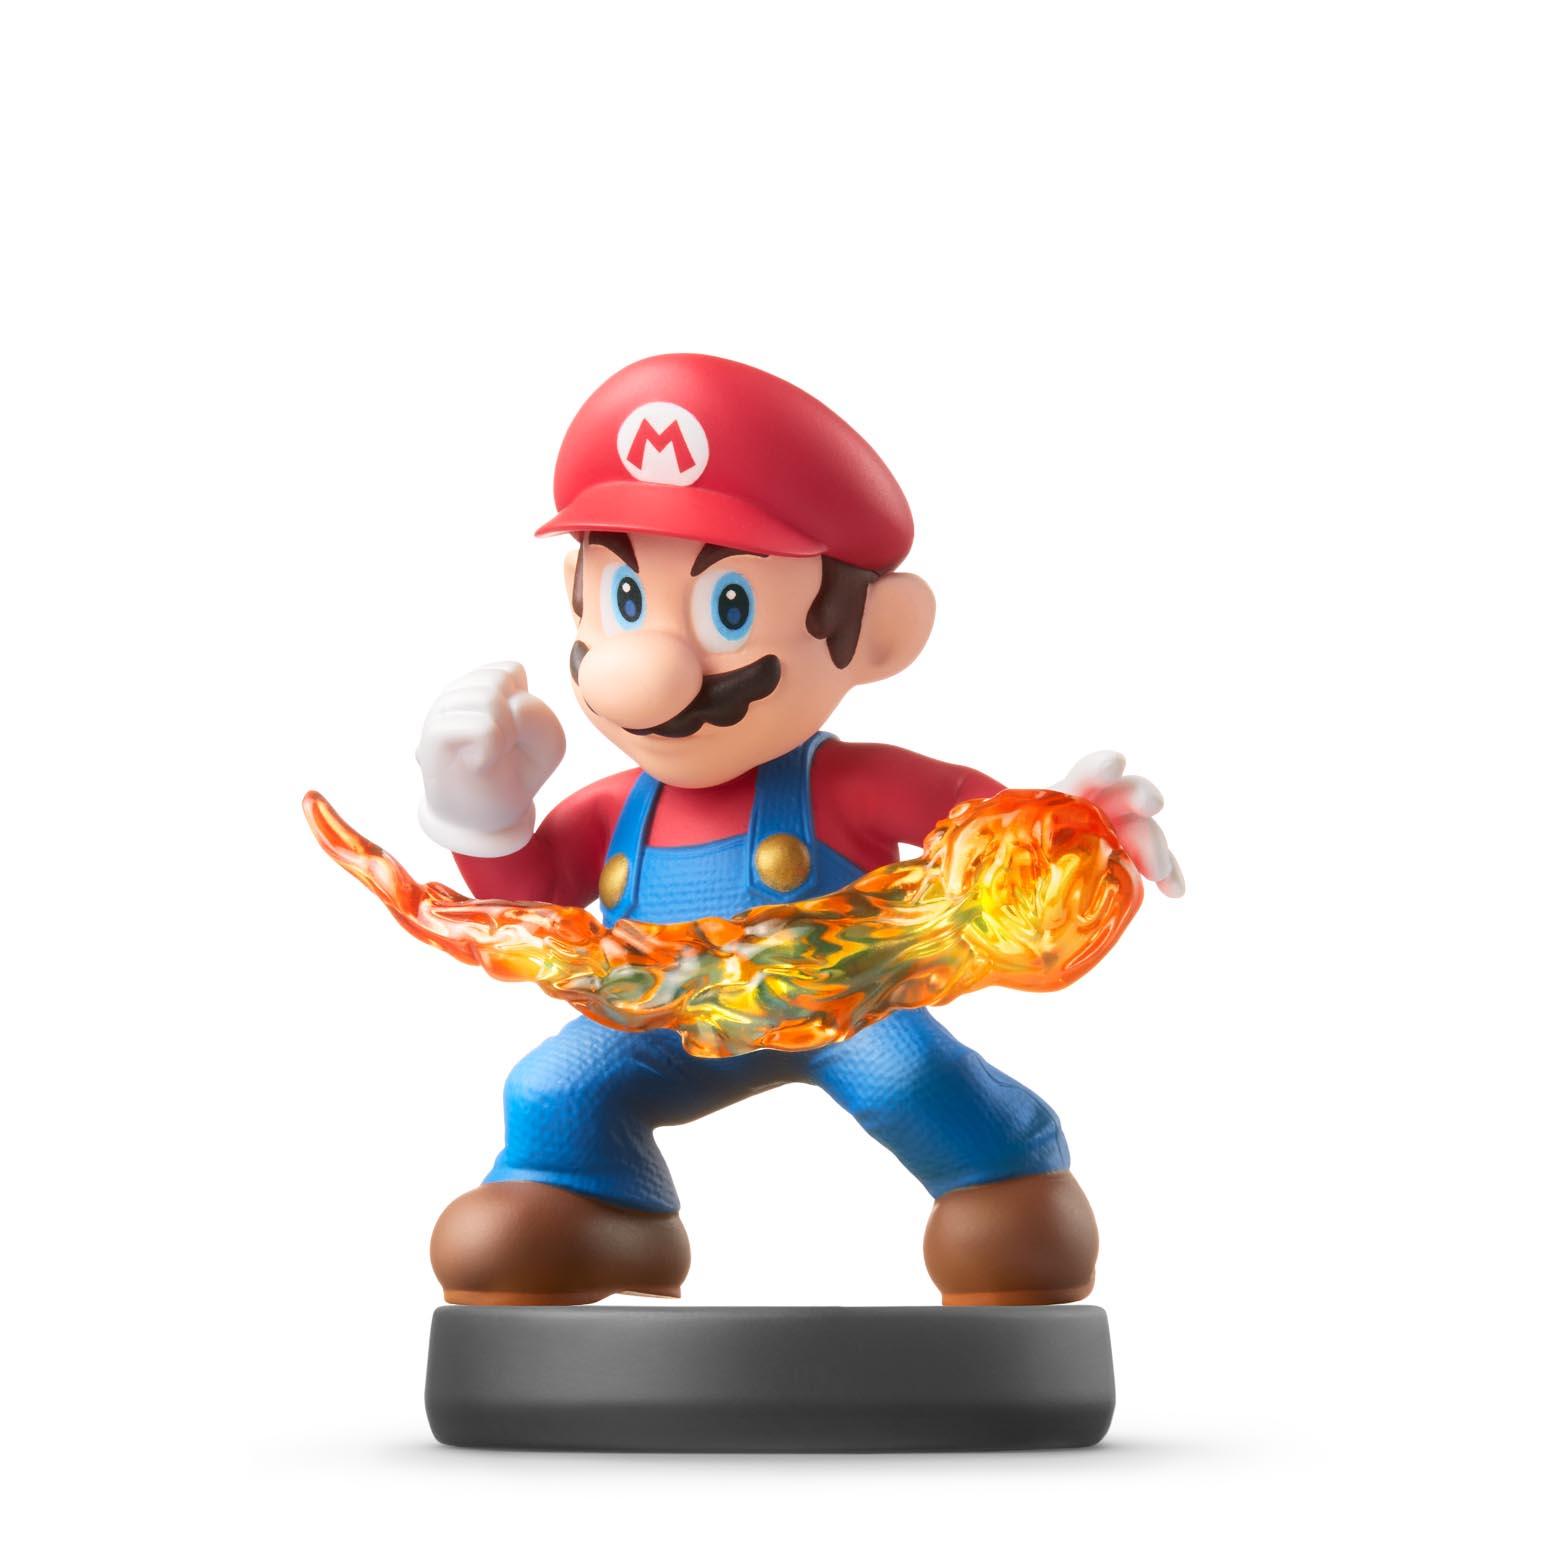 Mario amiibo prototype